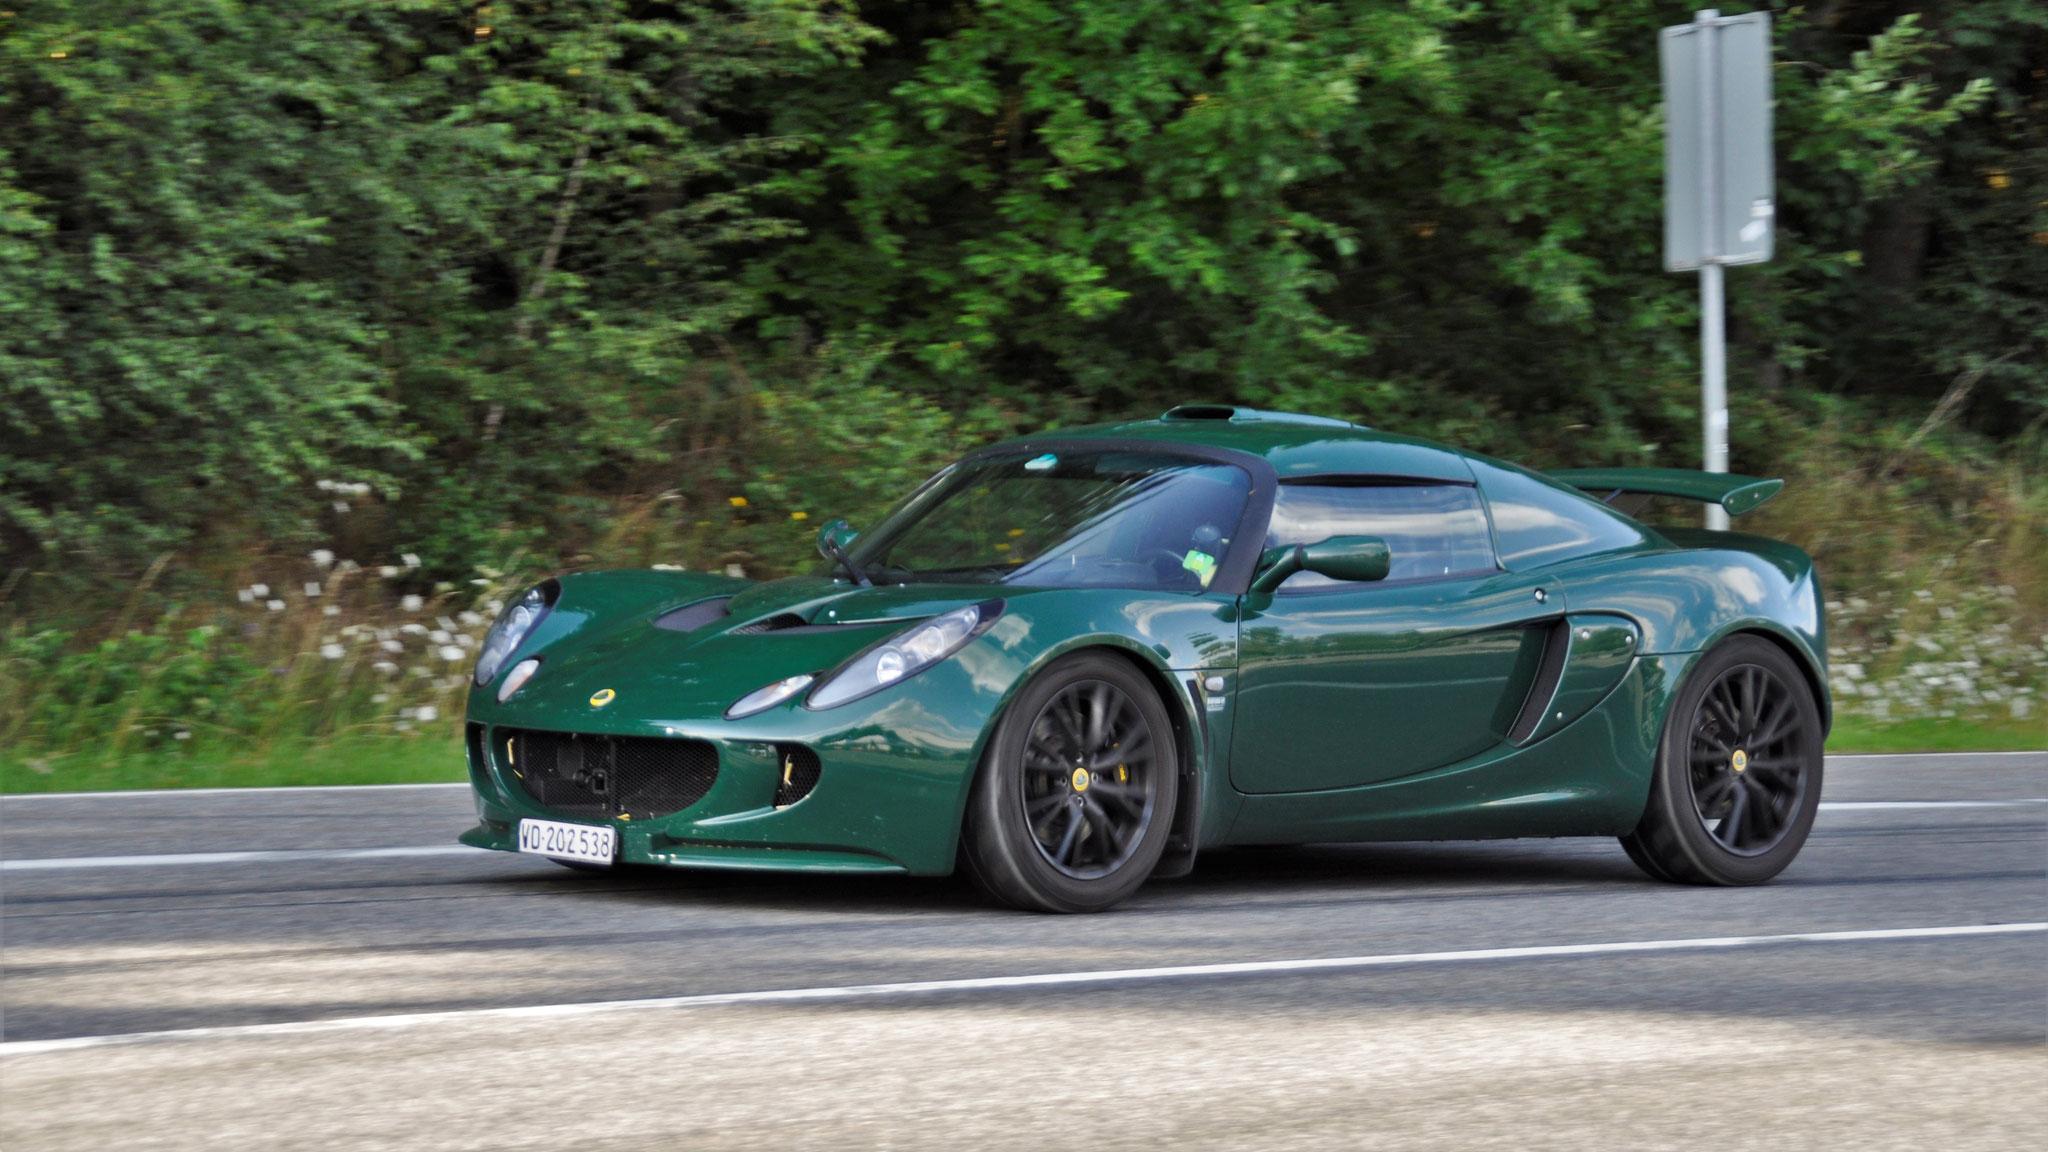 Lotus Elise S2 - VD-202538 (CH)